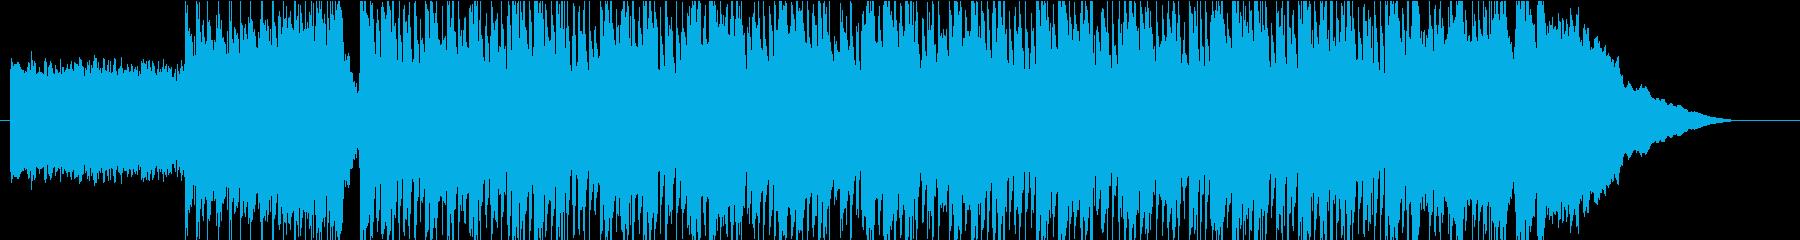 YouTubeのオープニングBGMに最適の再生済みの波形